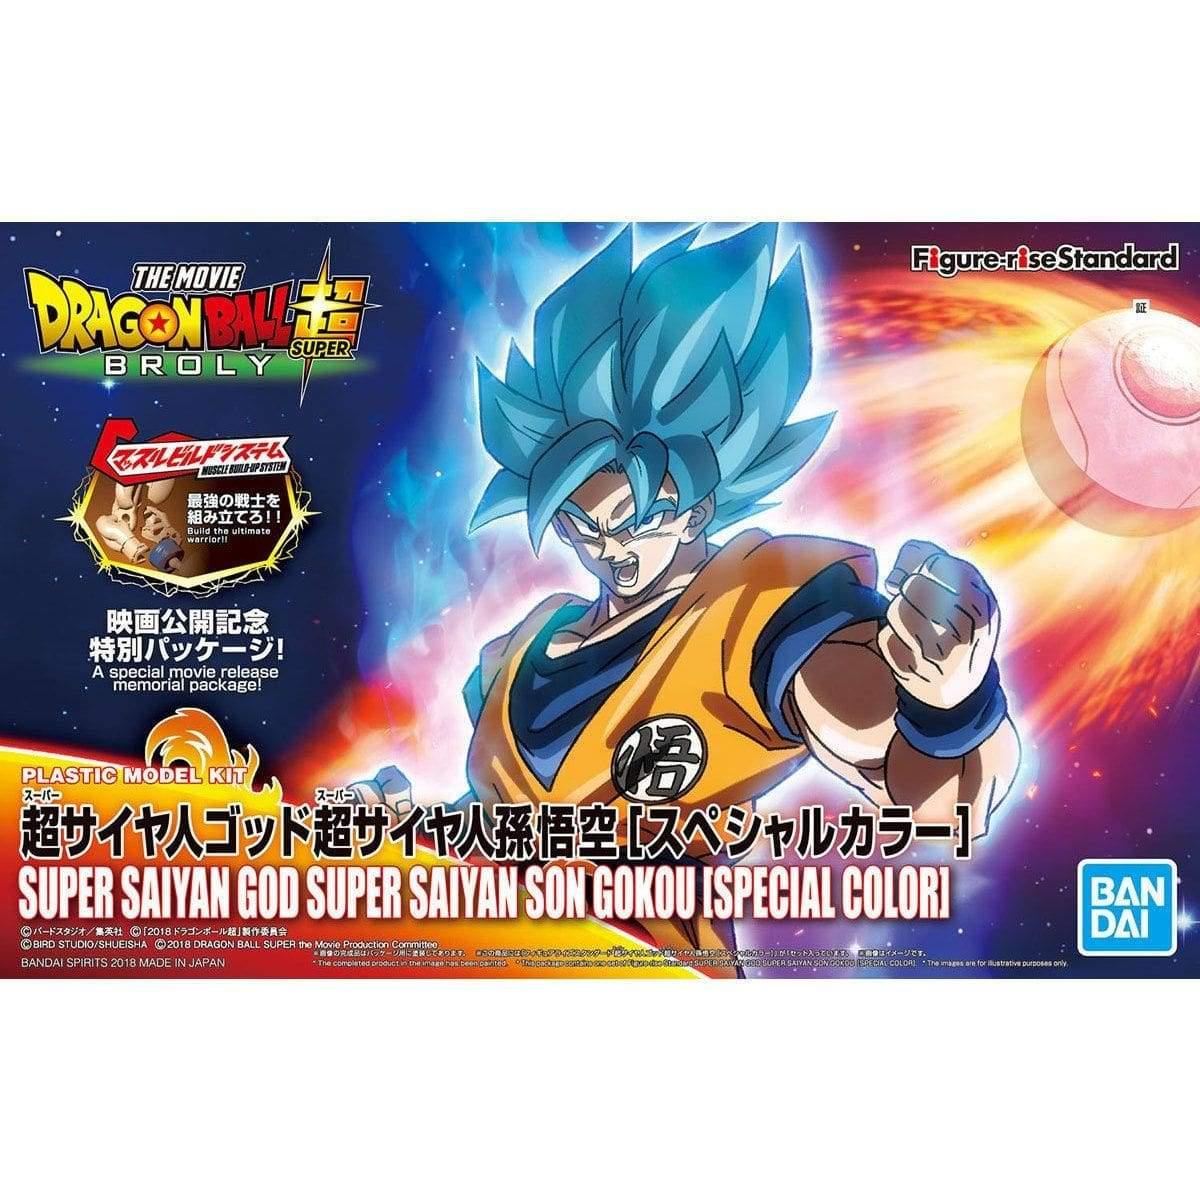 Image Dragon Ball Super - Figure-rise Standard Super Saiyan God Super Saiyan Goku Model Kit